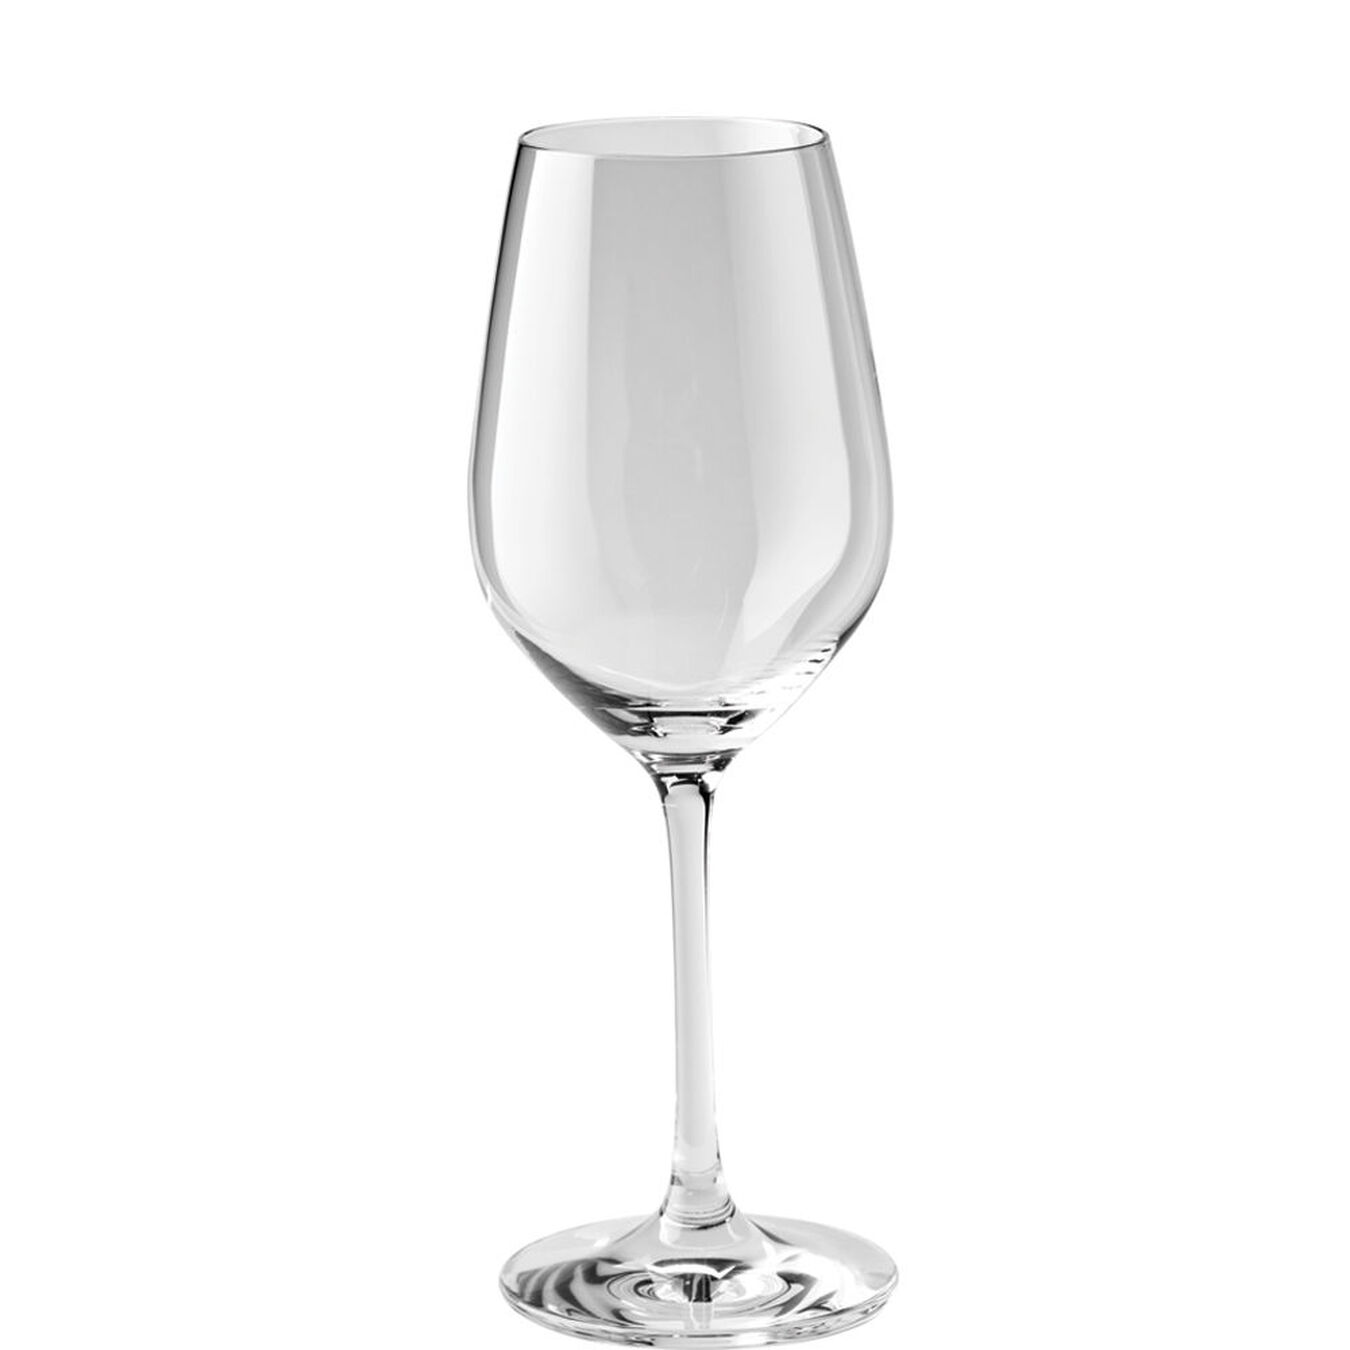 6-pc White Wine Glass Set,,large 1